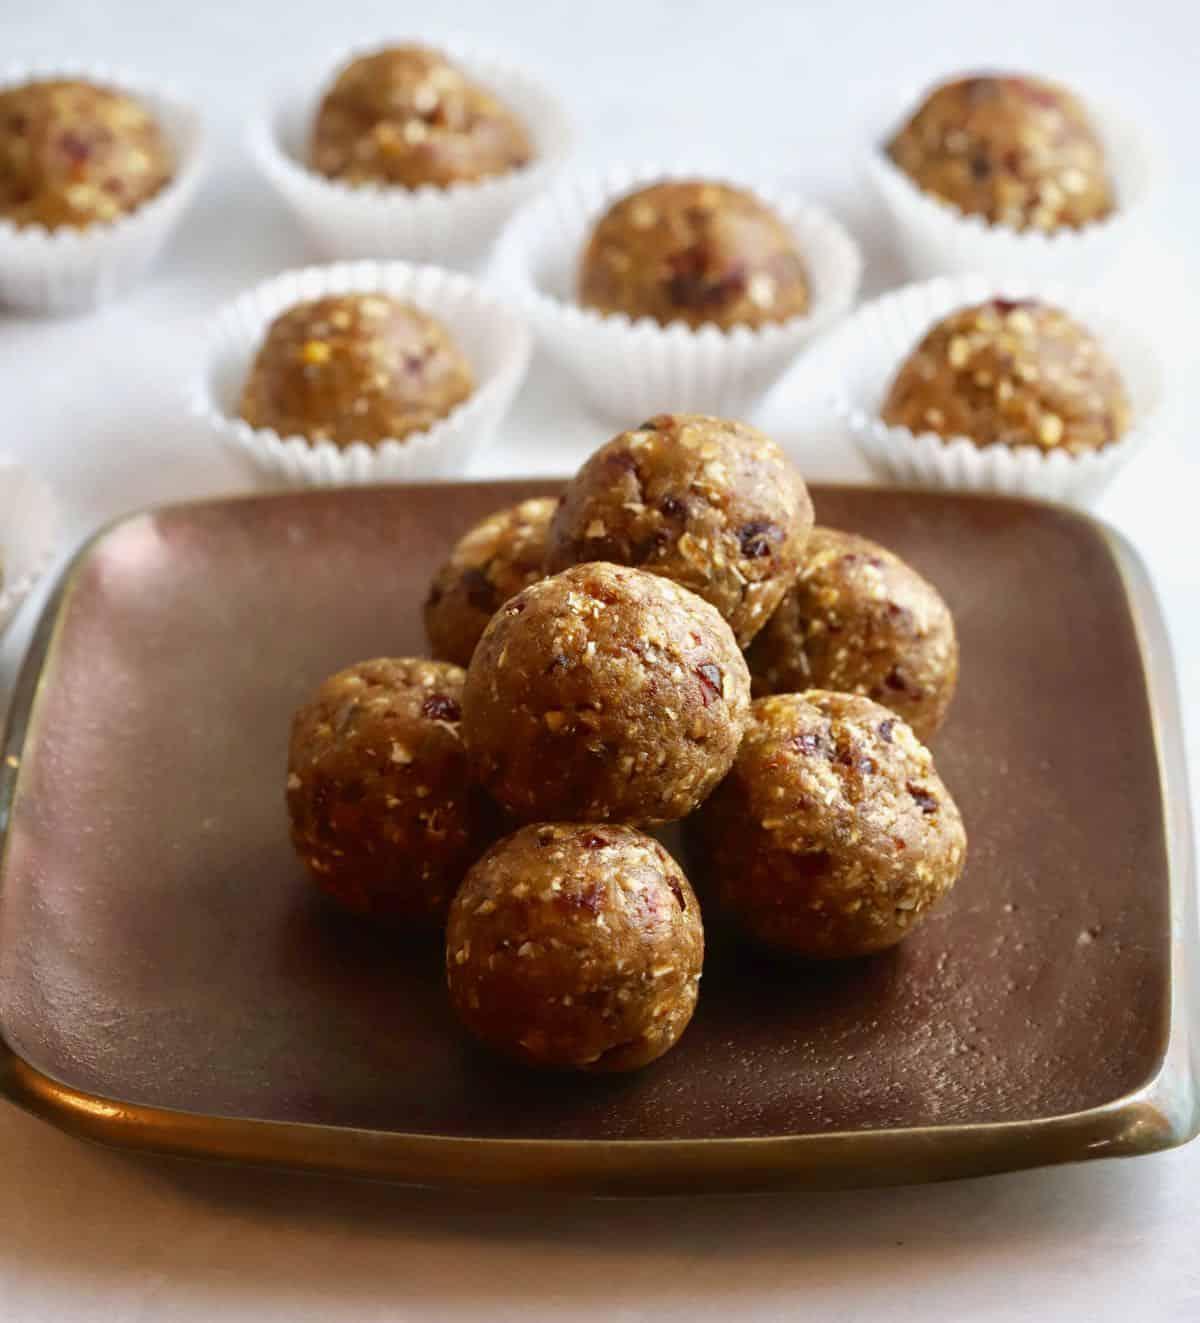 A bronze plate full of oatmeal energy balls.